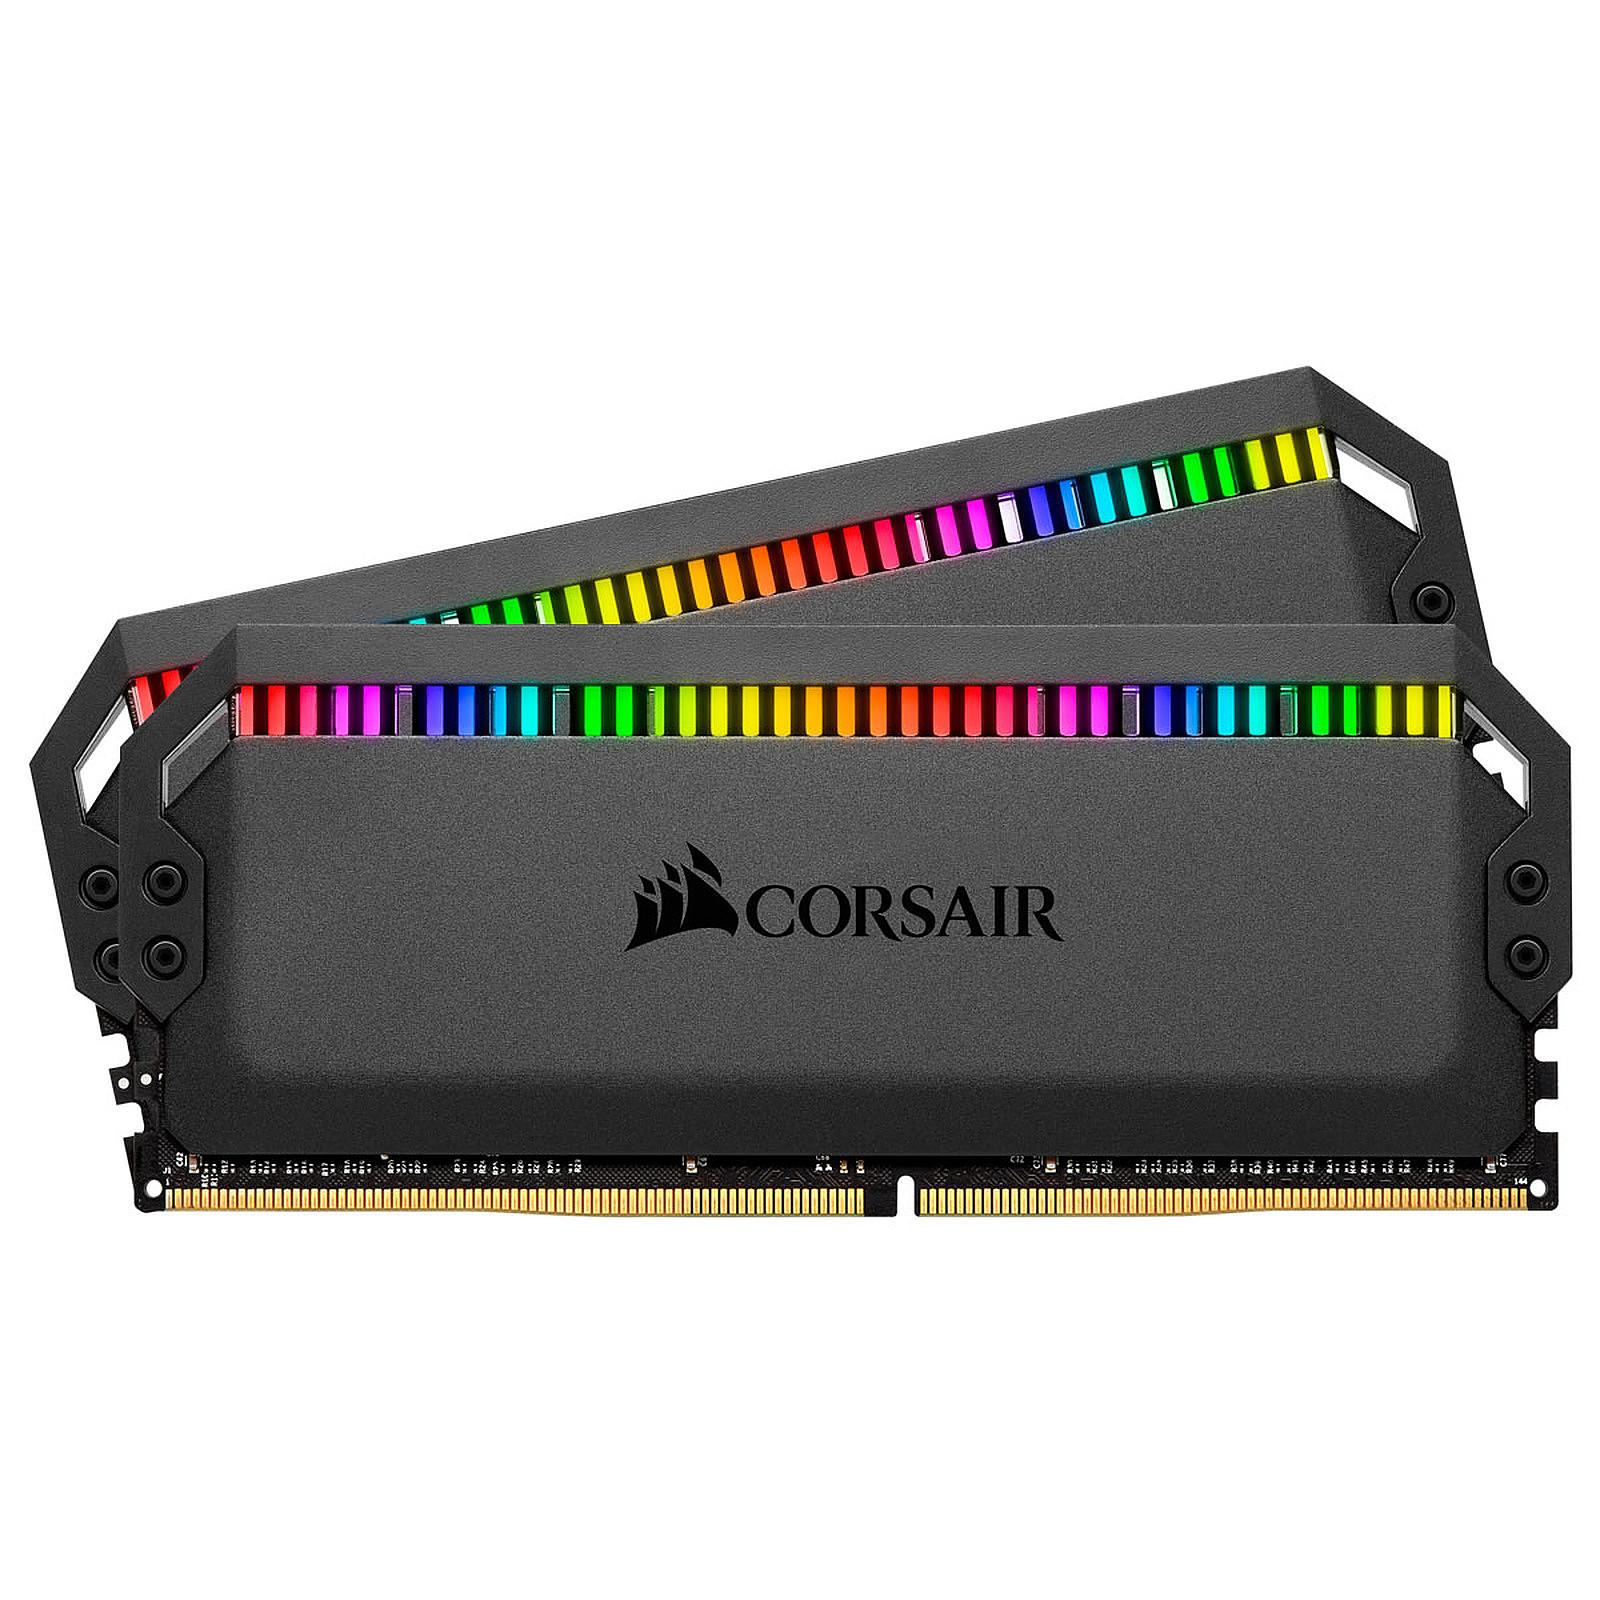 Corsair Dominator Platinum RGB 64 Go (2 x 32 Go) DDR4 3200 MHz CL16